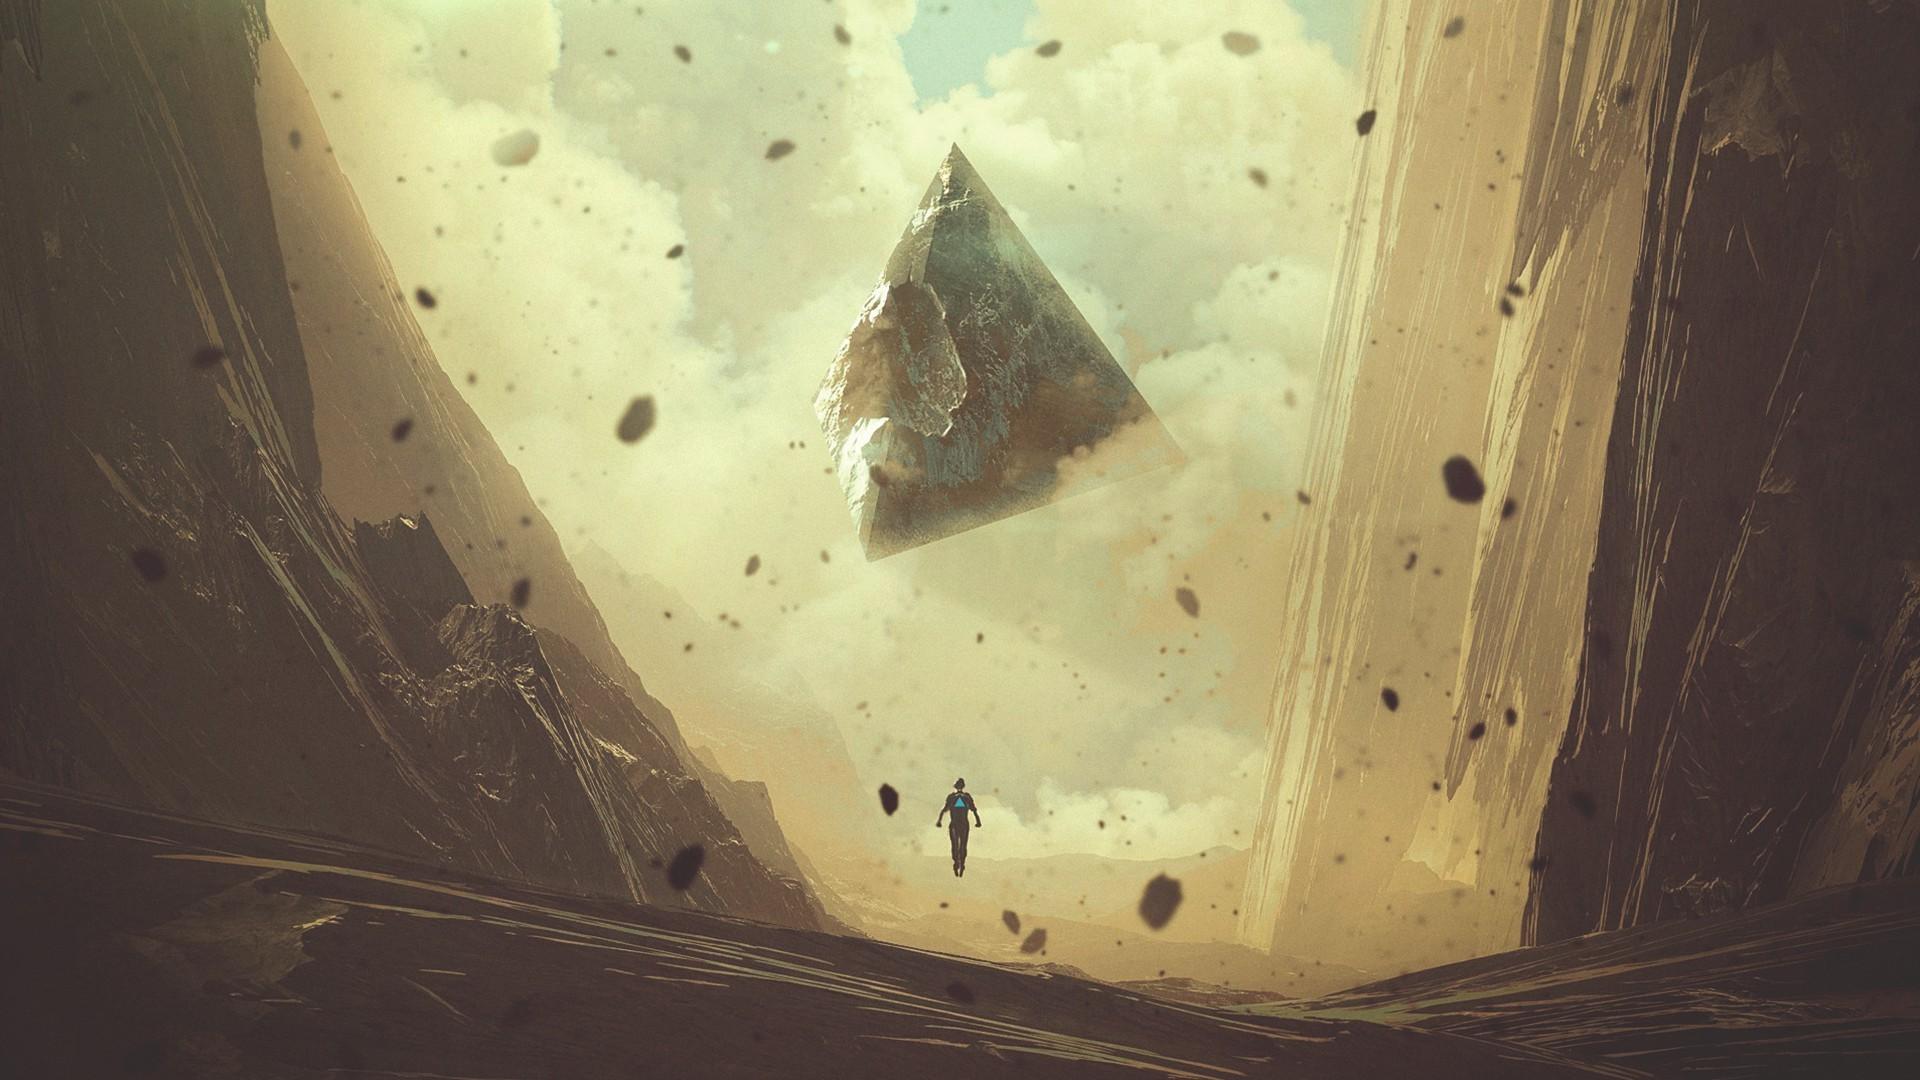 1920x1080 Px Fantasy Art Pyramid